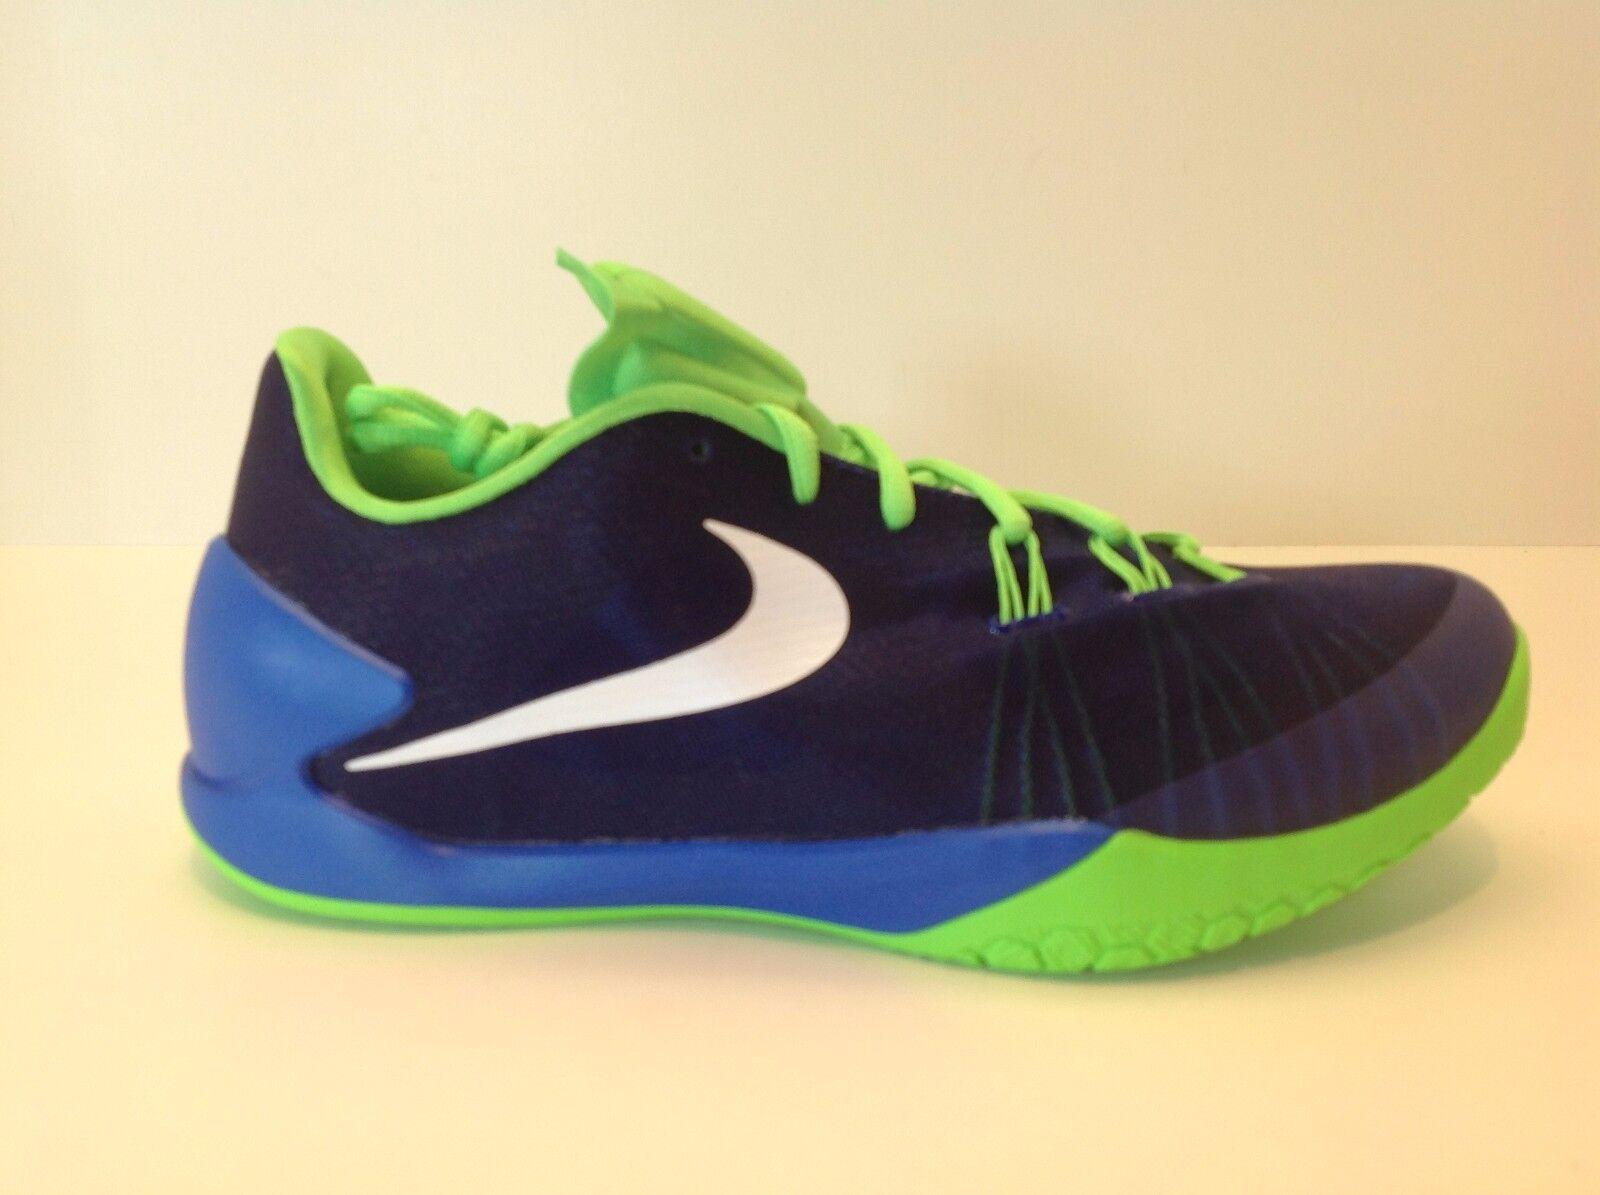 Nike Hyperchase Men's Blue/Green Size 8.5-12 New in Box 705363 413